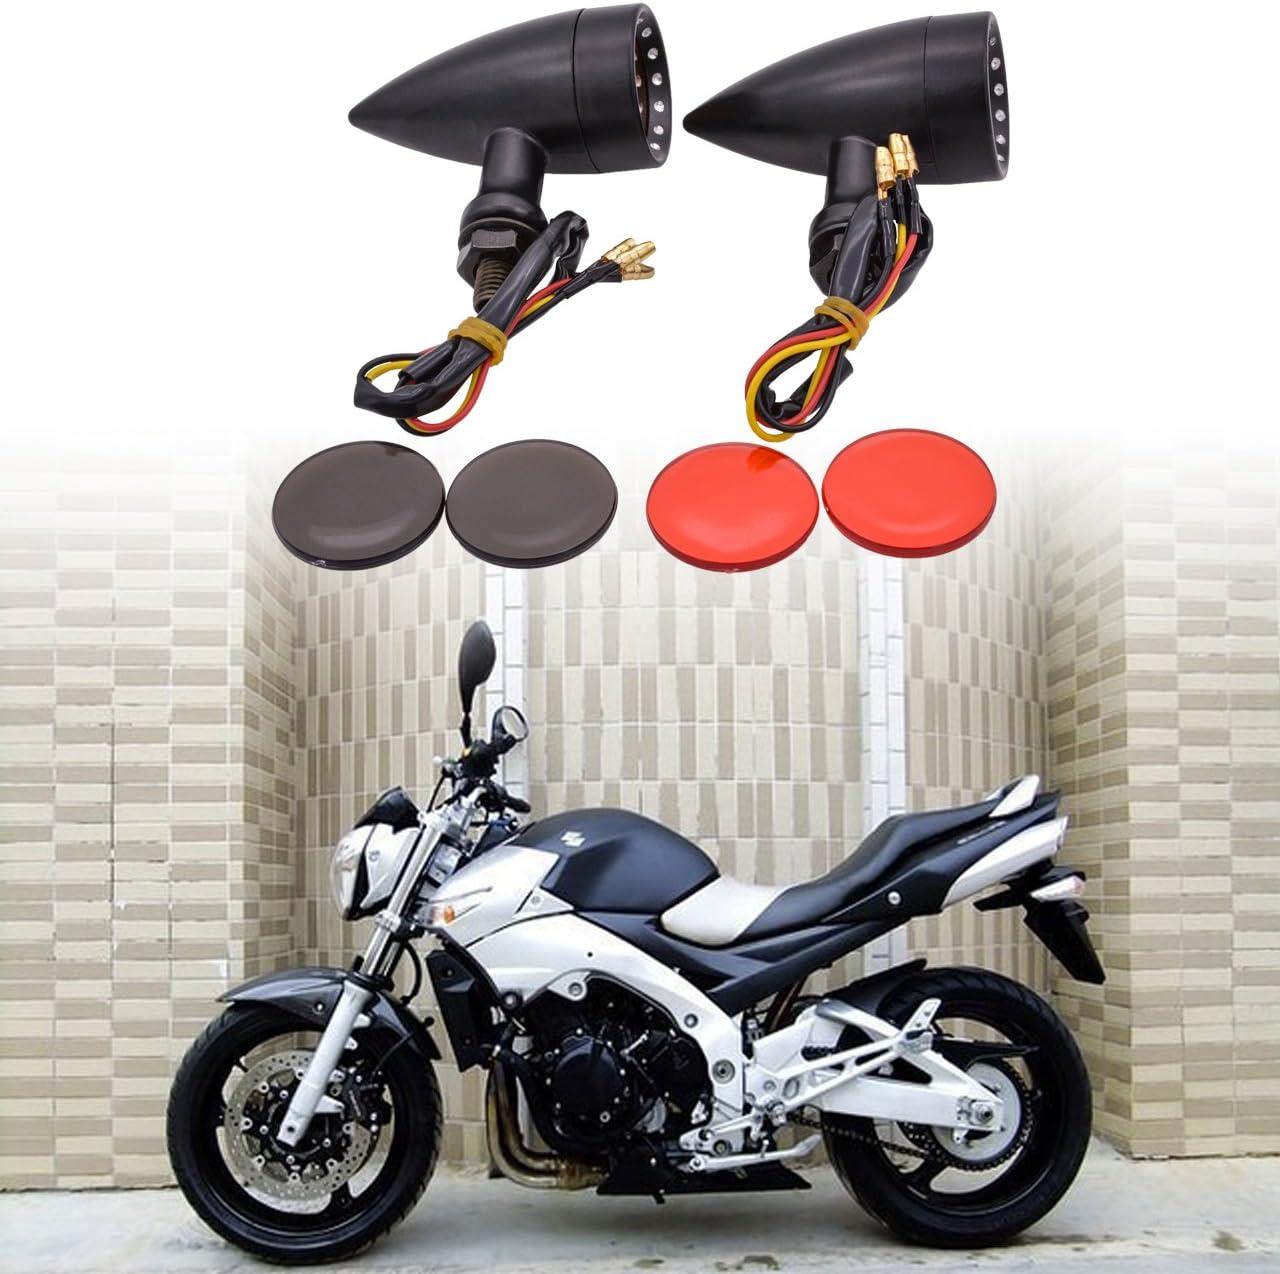 TUINCYN Motorcycle Bullet Shaped Metal Turn Signals Indicator Lights Mini Front Motor Bulb Amber//Yellow Light Universal Fits Harley Honda Yamaha Suzuki Kawasaki Cruiser Chopper Cafe Racer Pack of 2